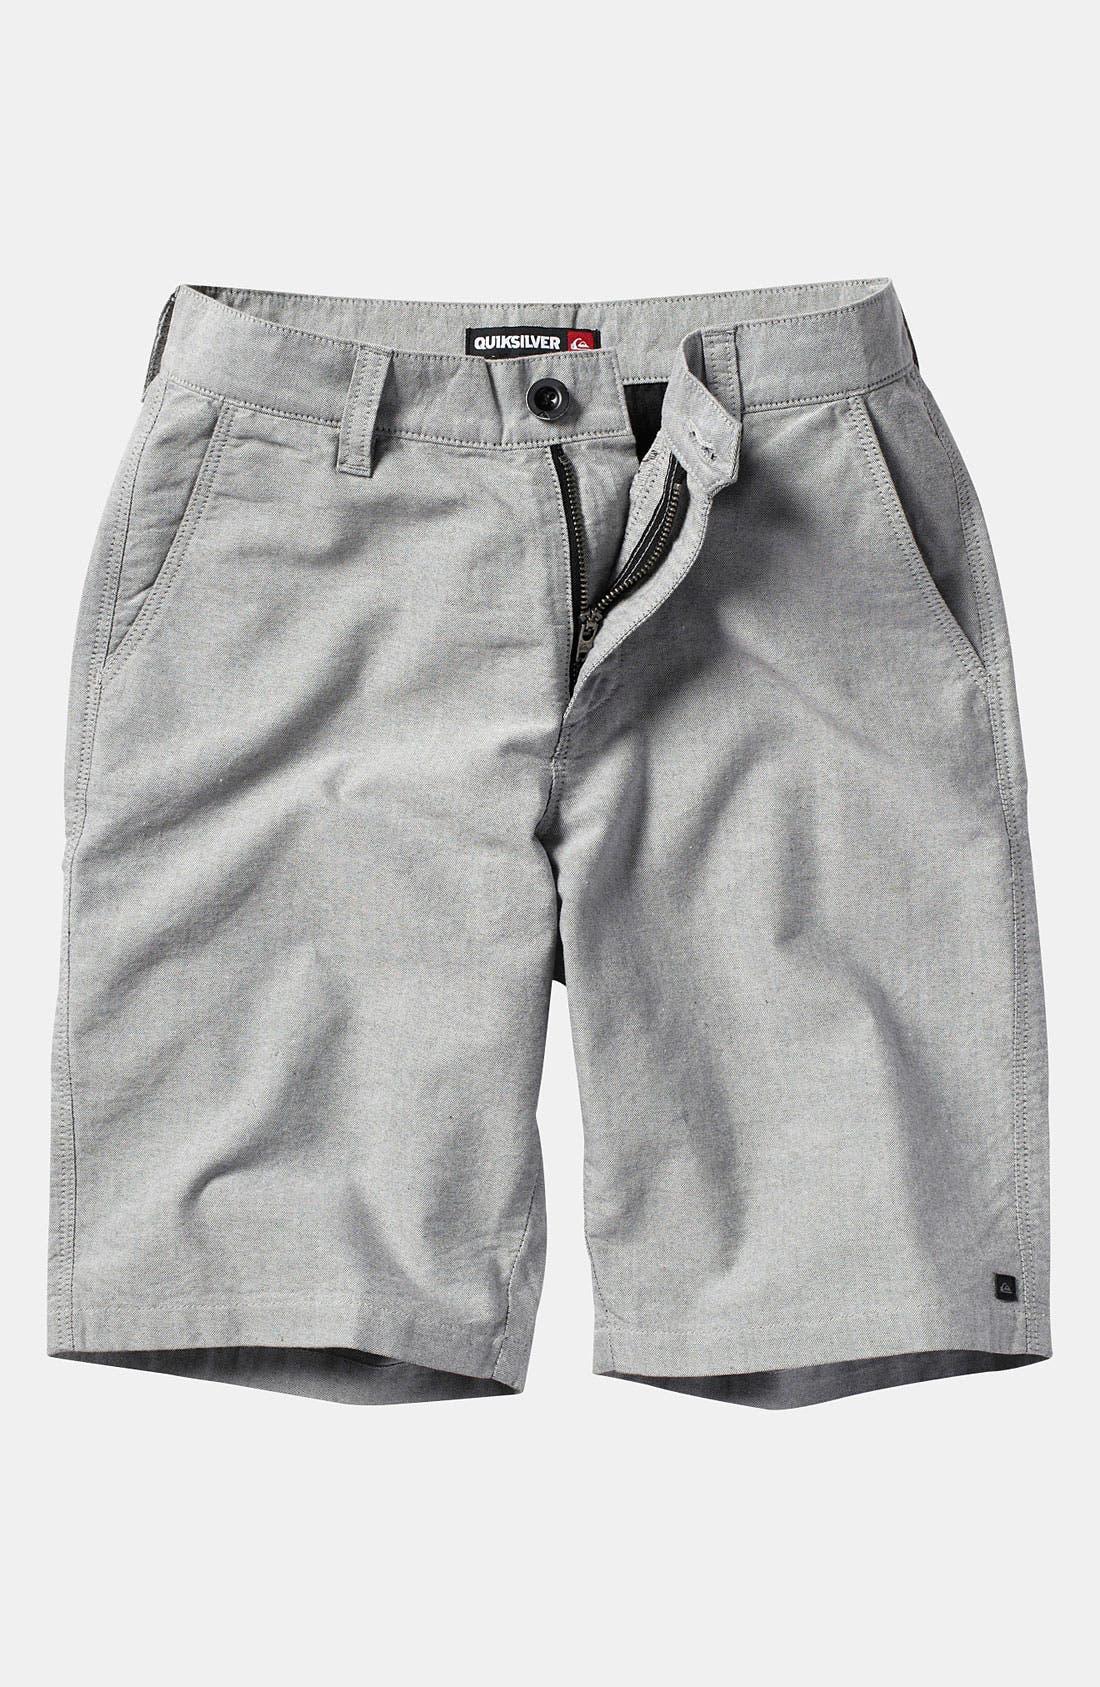 Main Image - Quiksilver 'Thurston' Chambray Shorts (Big Boys)